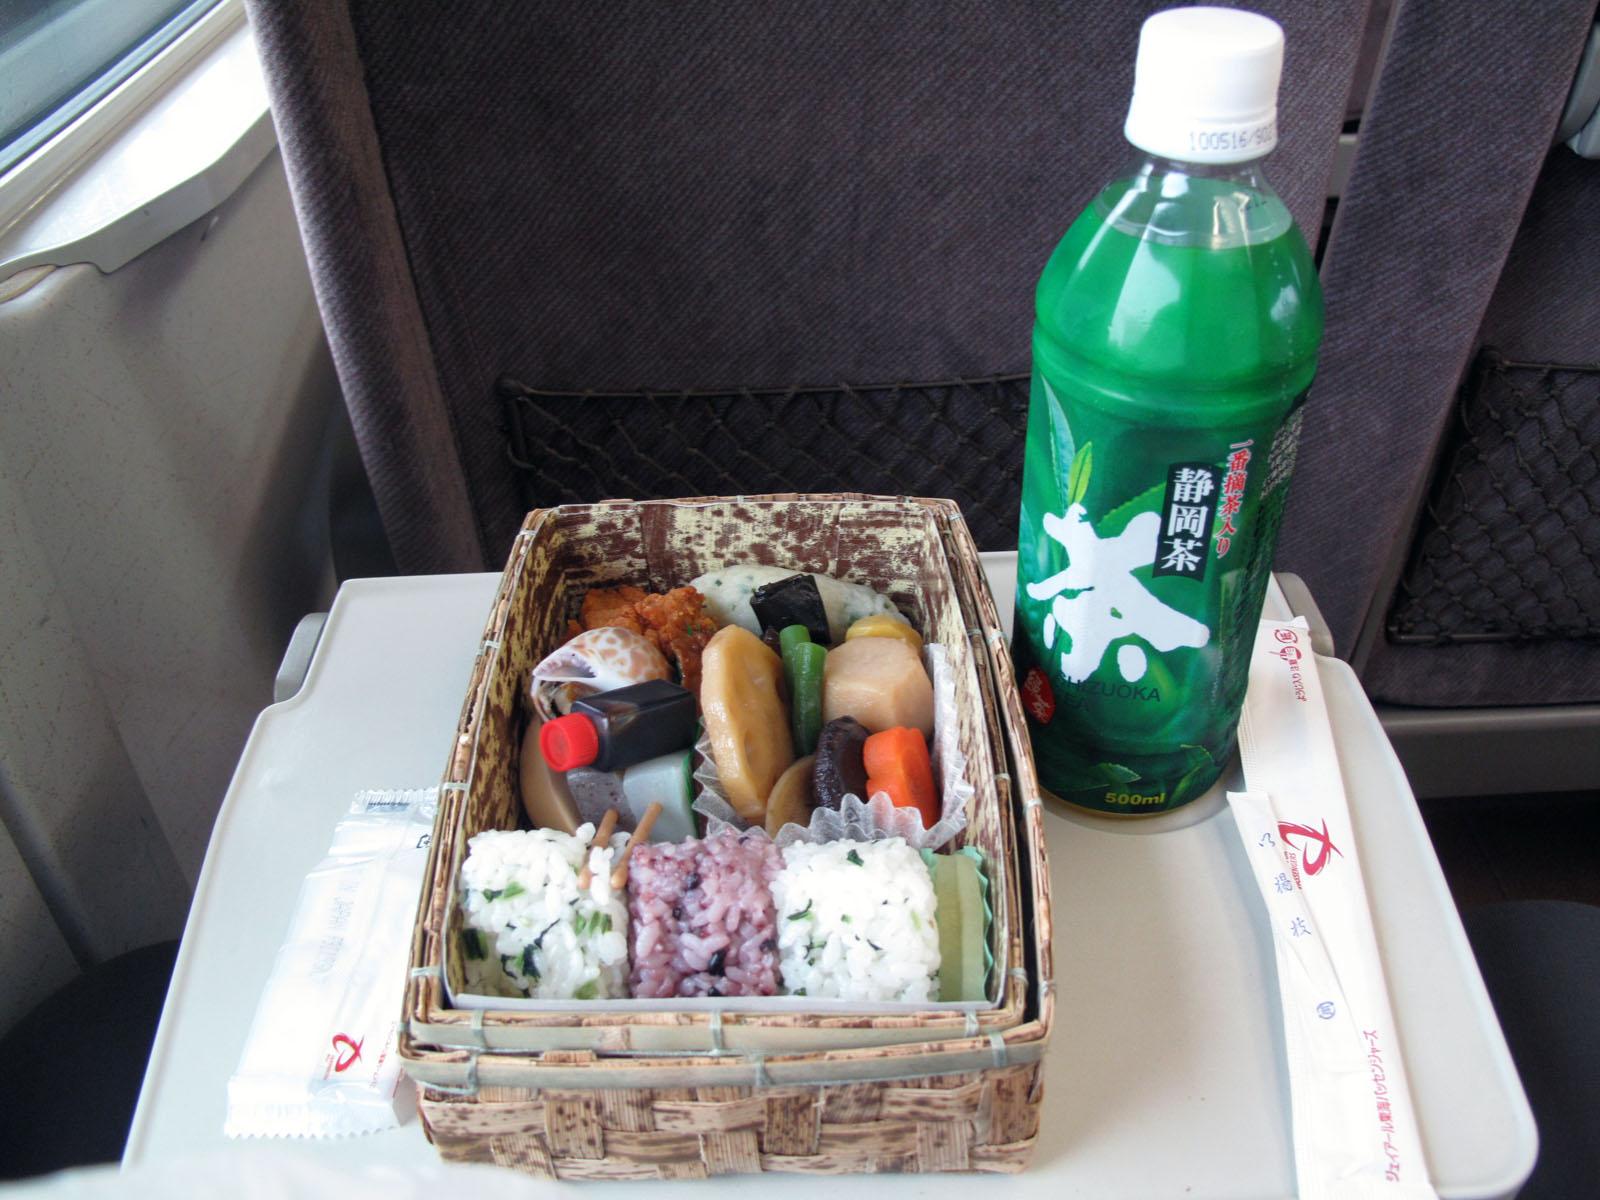 lunch box bento box welcome to ucikura s blog bloguru. Black Bedroom Furniture Sets. Home Design Ideas